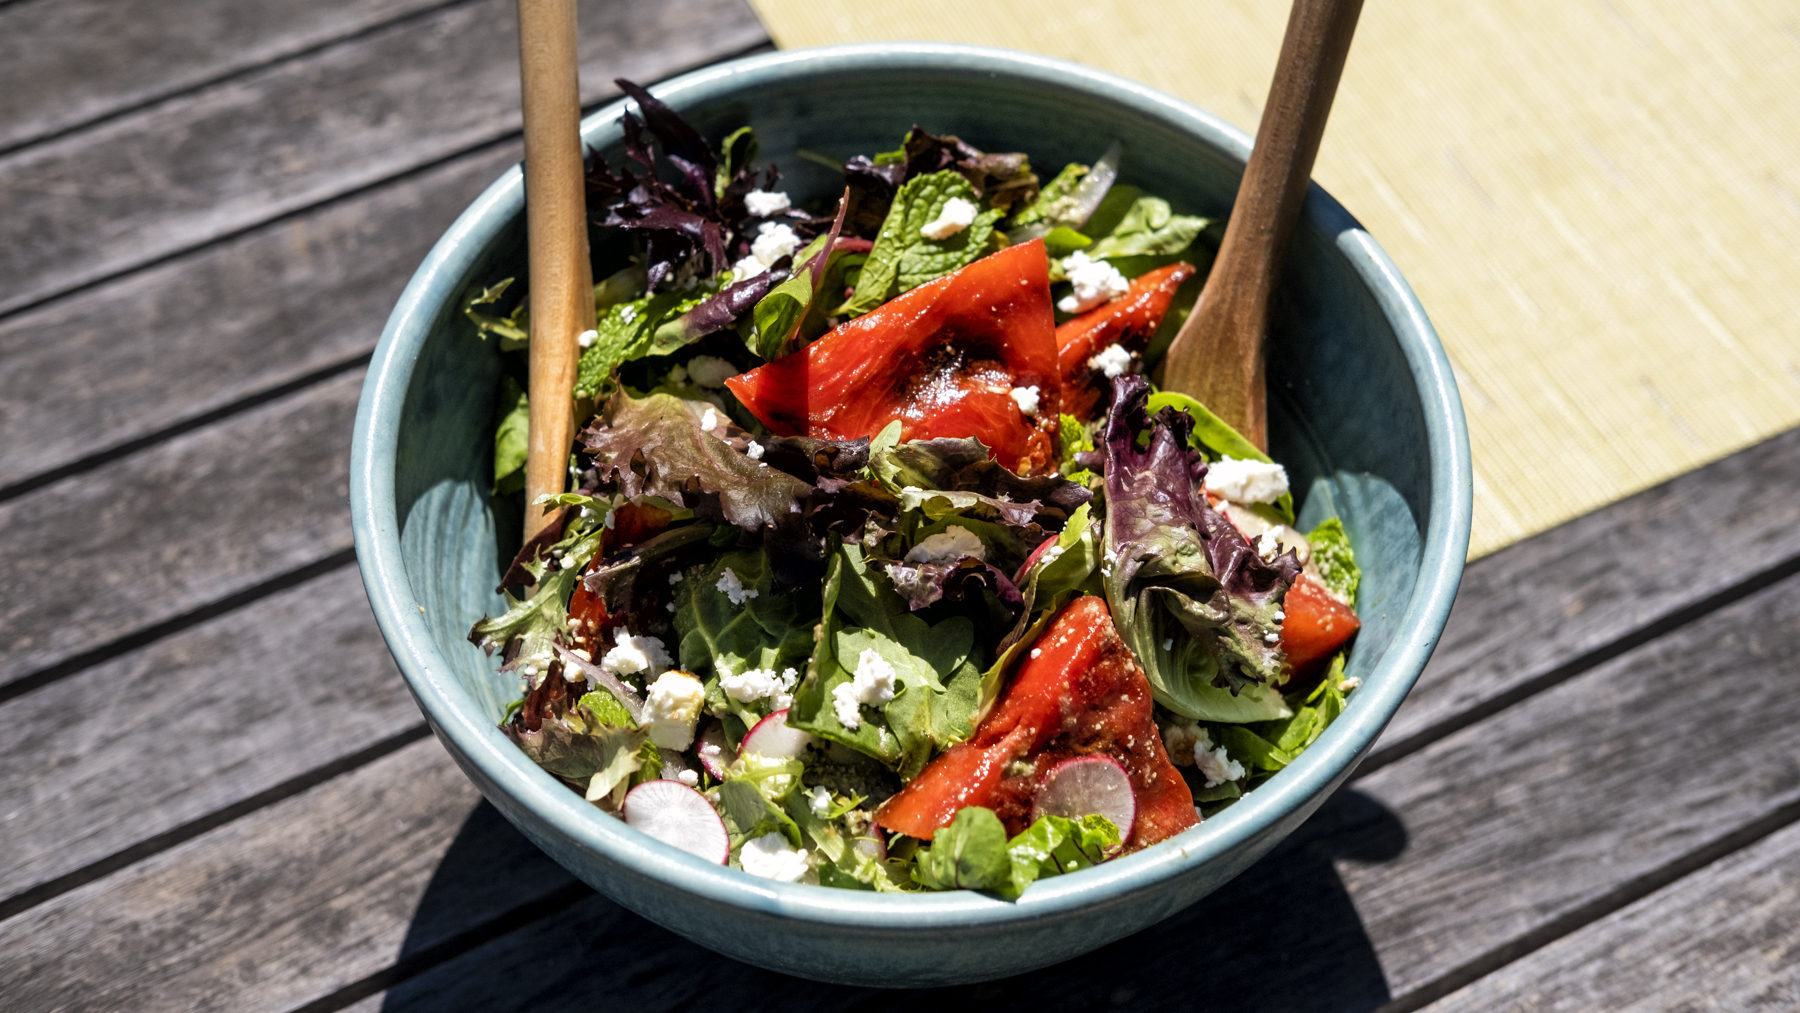 Grilled Watermelon & Radish Salad with Green Goddess Dressing